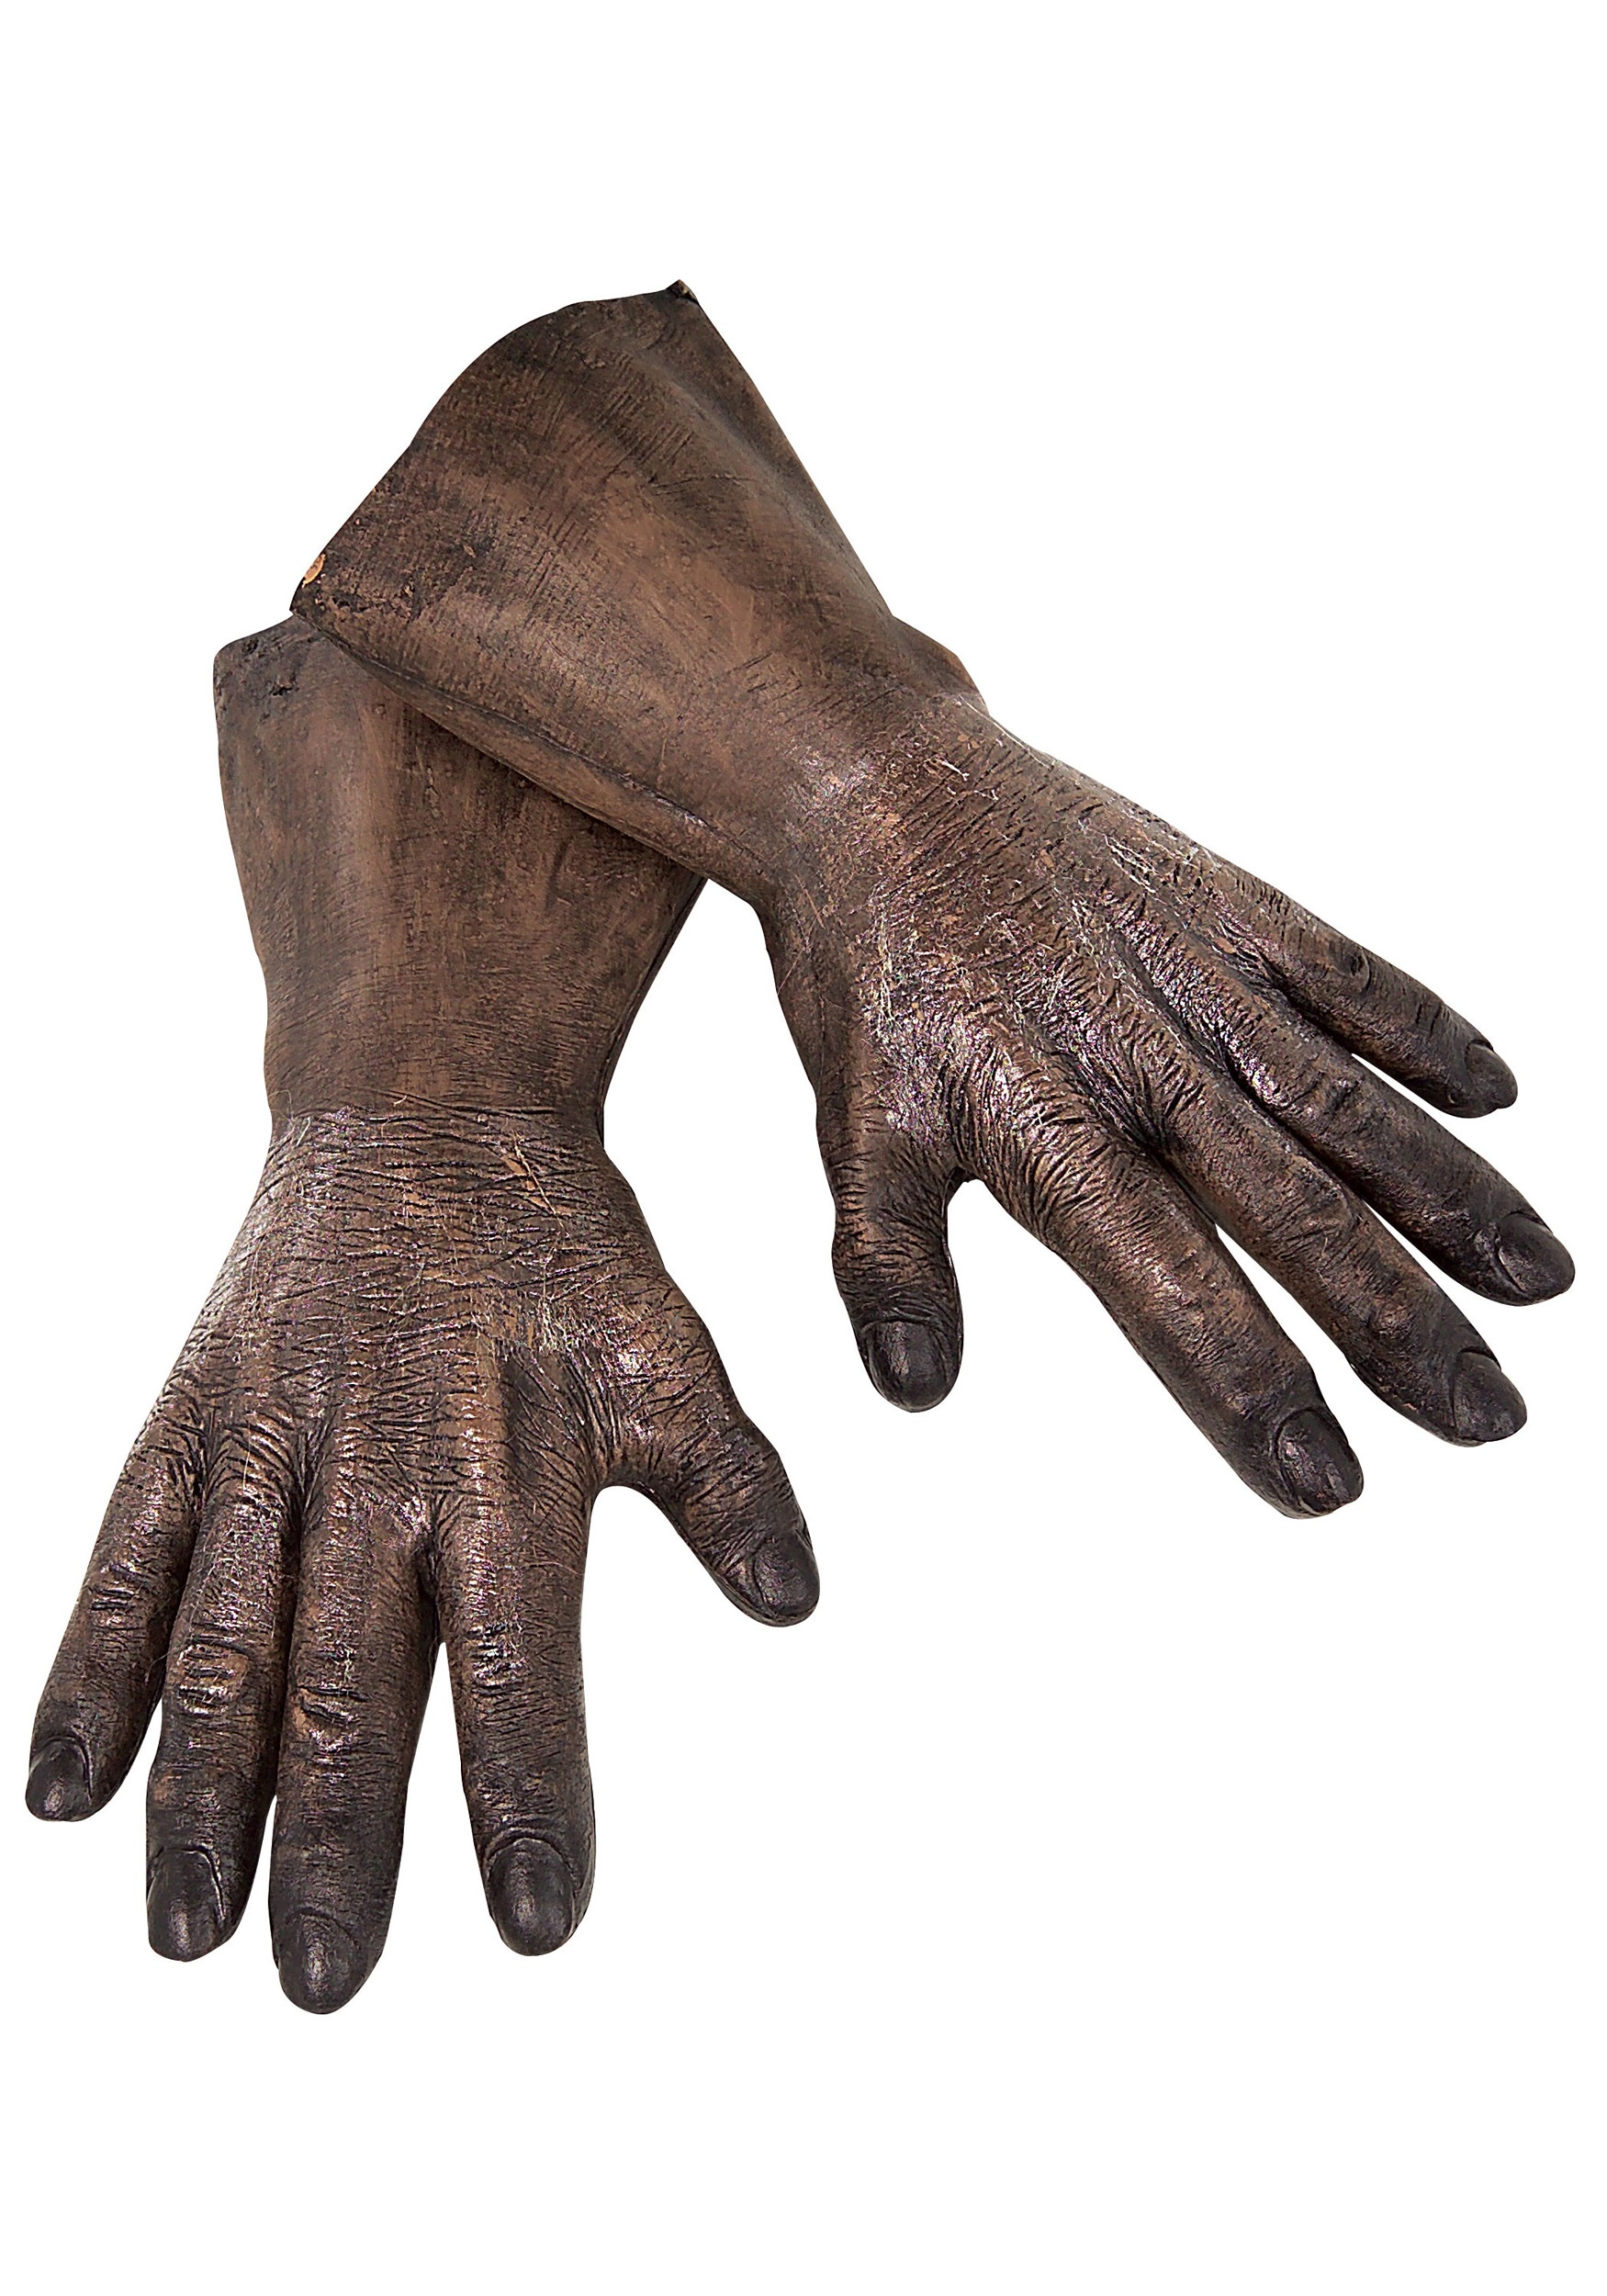 Deluxe Chewbacca Latex Hands